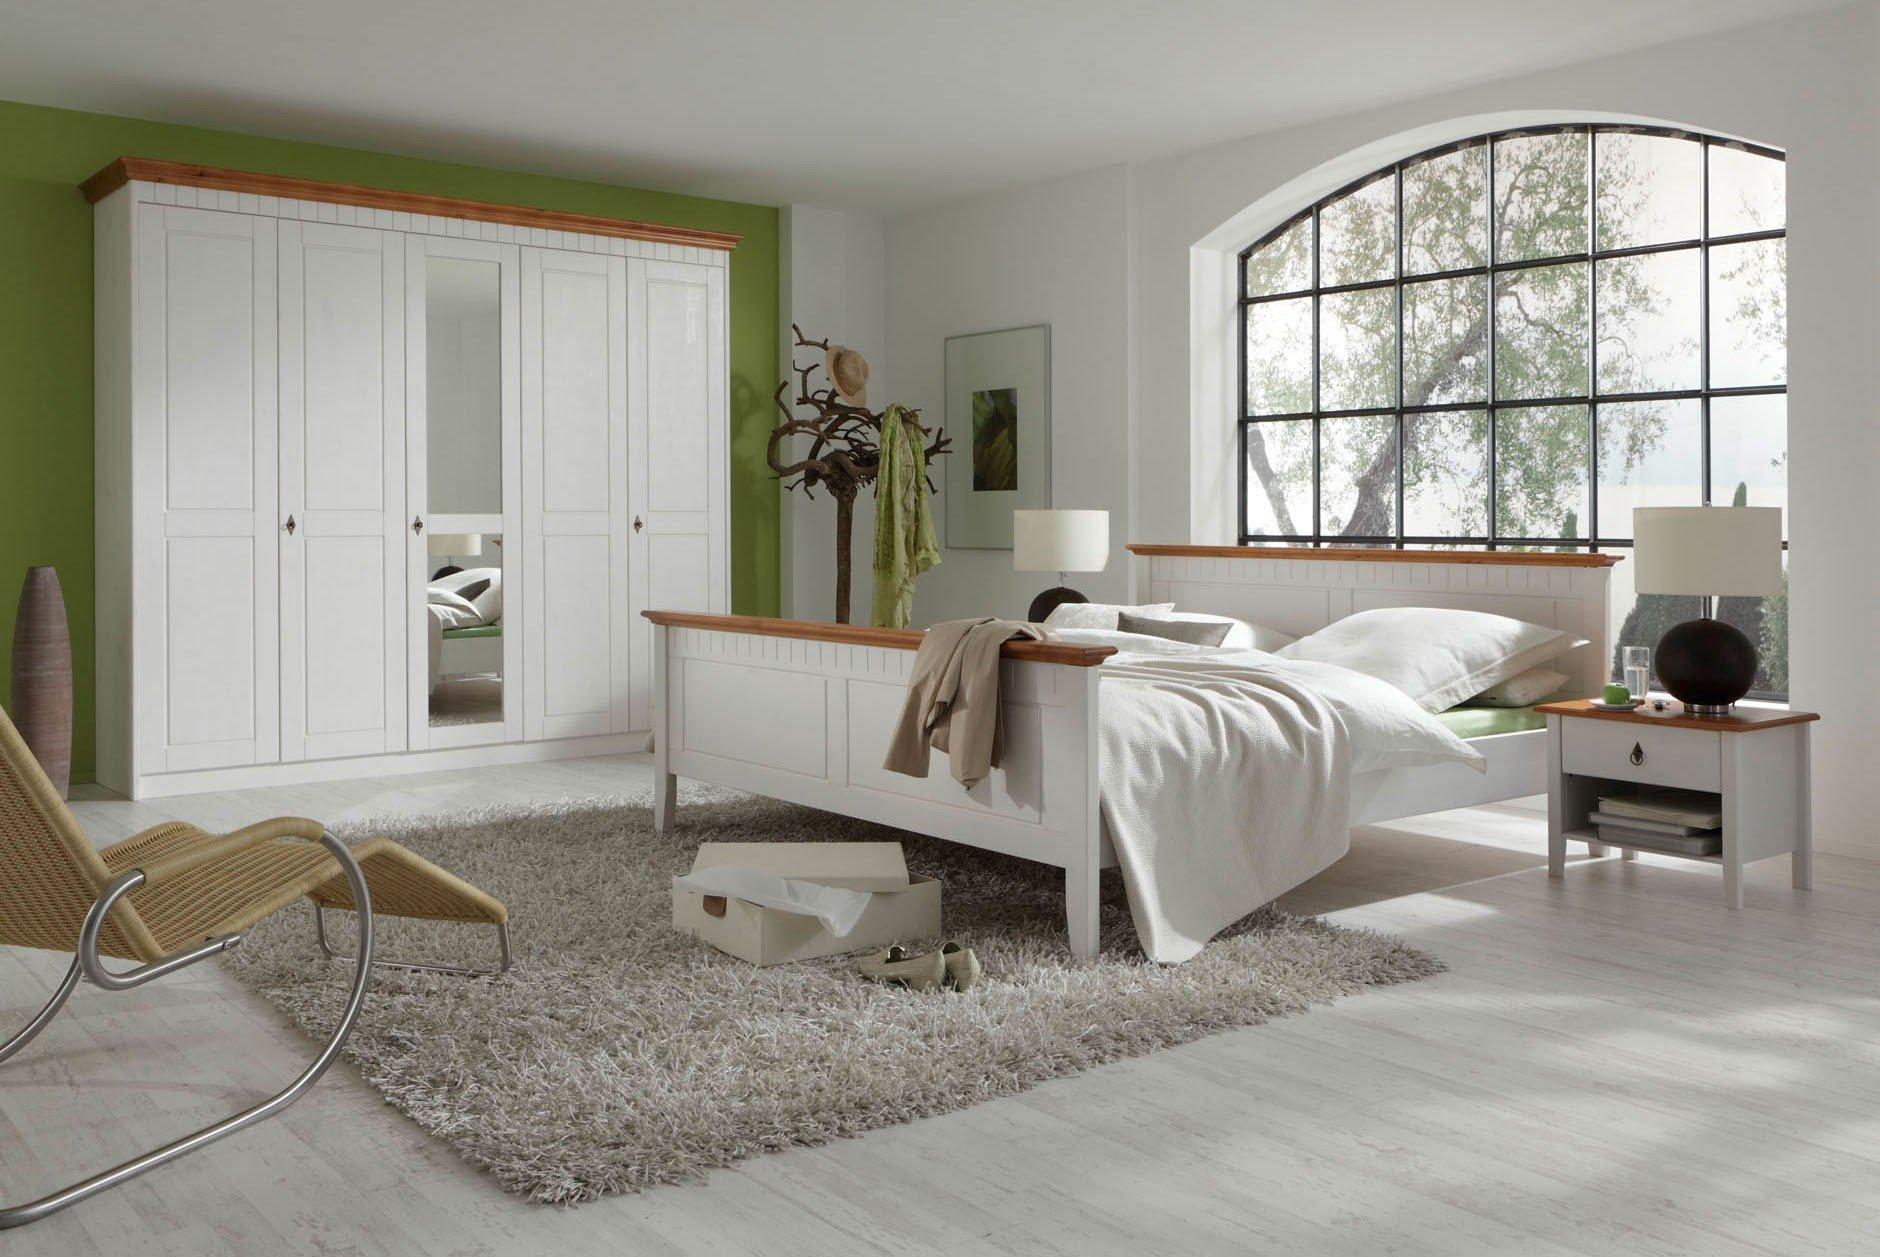 Forestdream Capri KomplettSchlafzimmer Kiefer wei